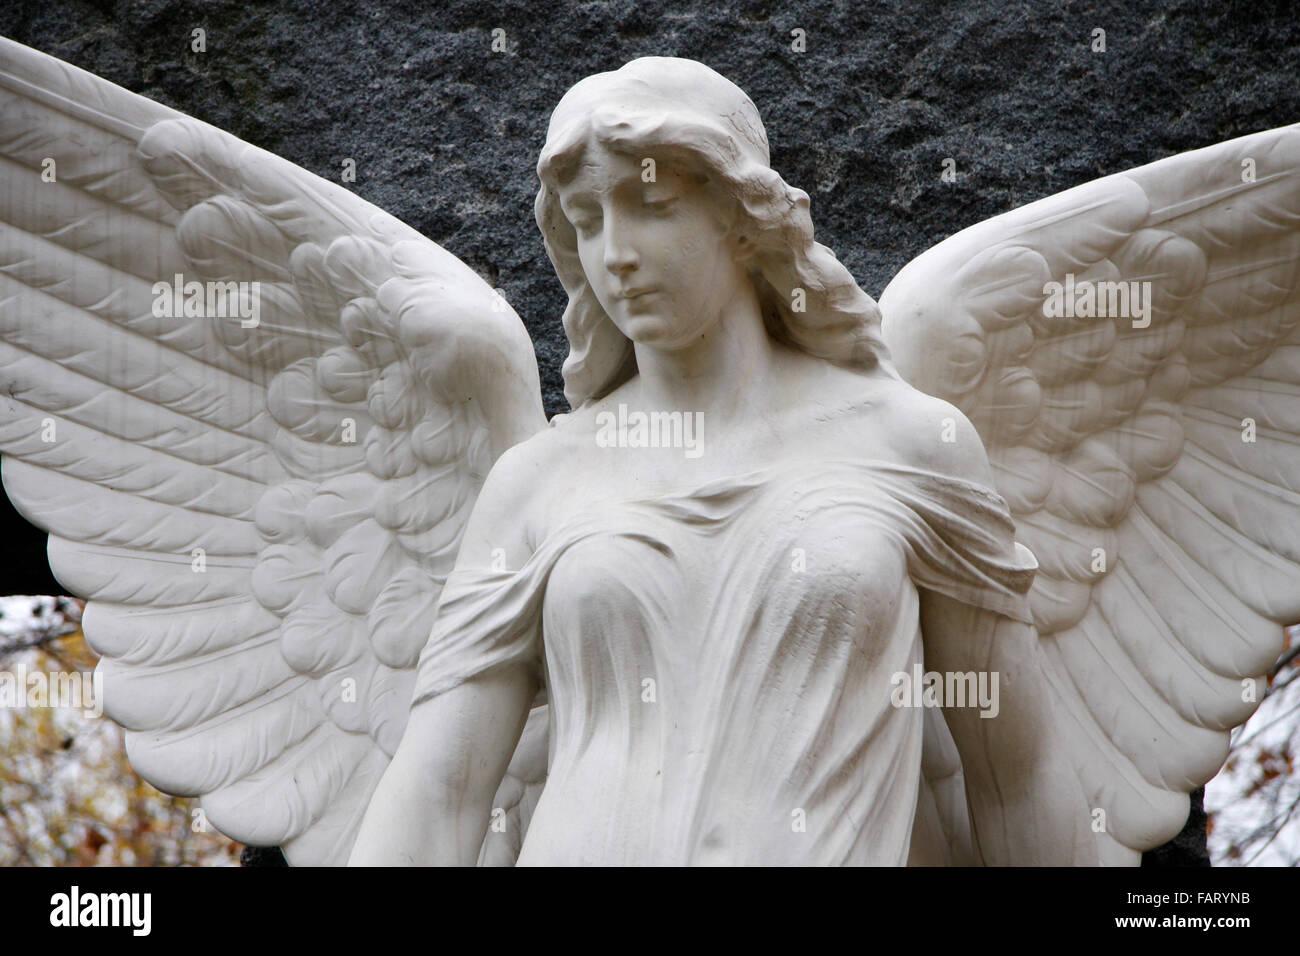 Engel, Skulptur, Invaliden-Friedhof, Berlin-Mitte. Stockbild